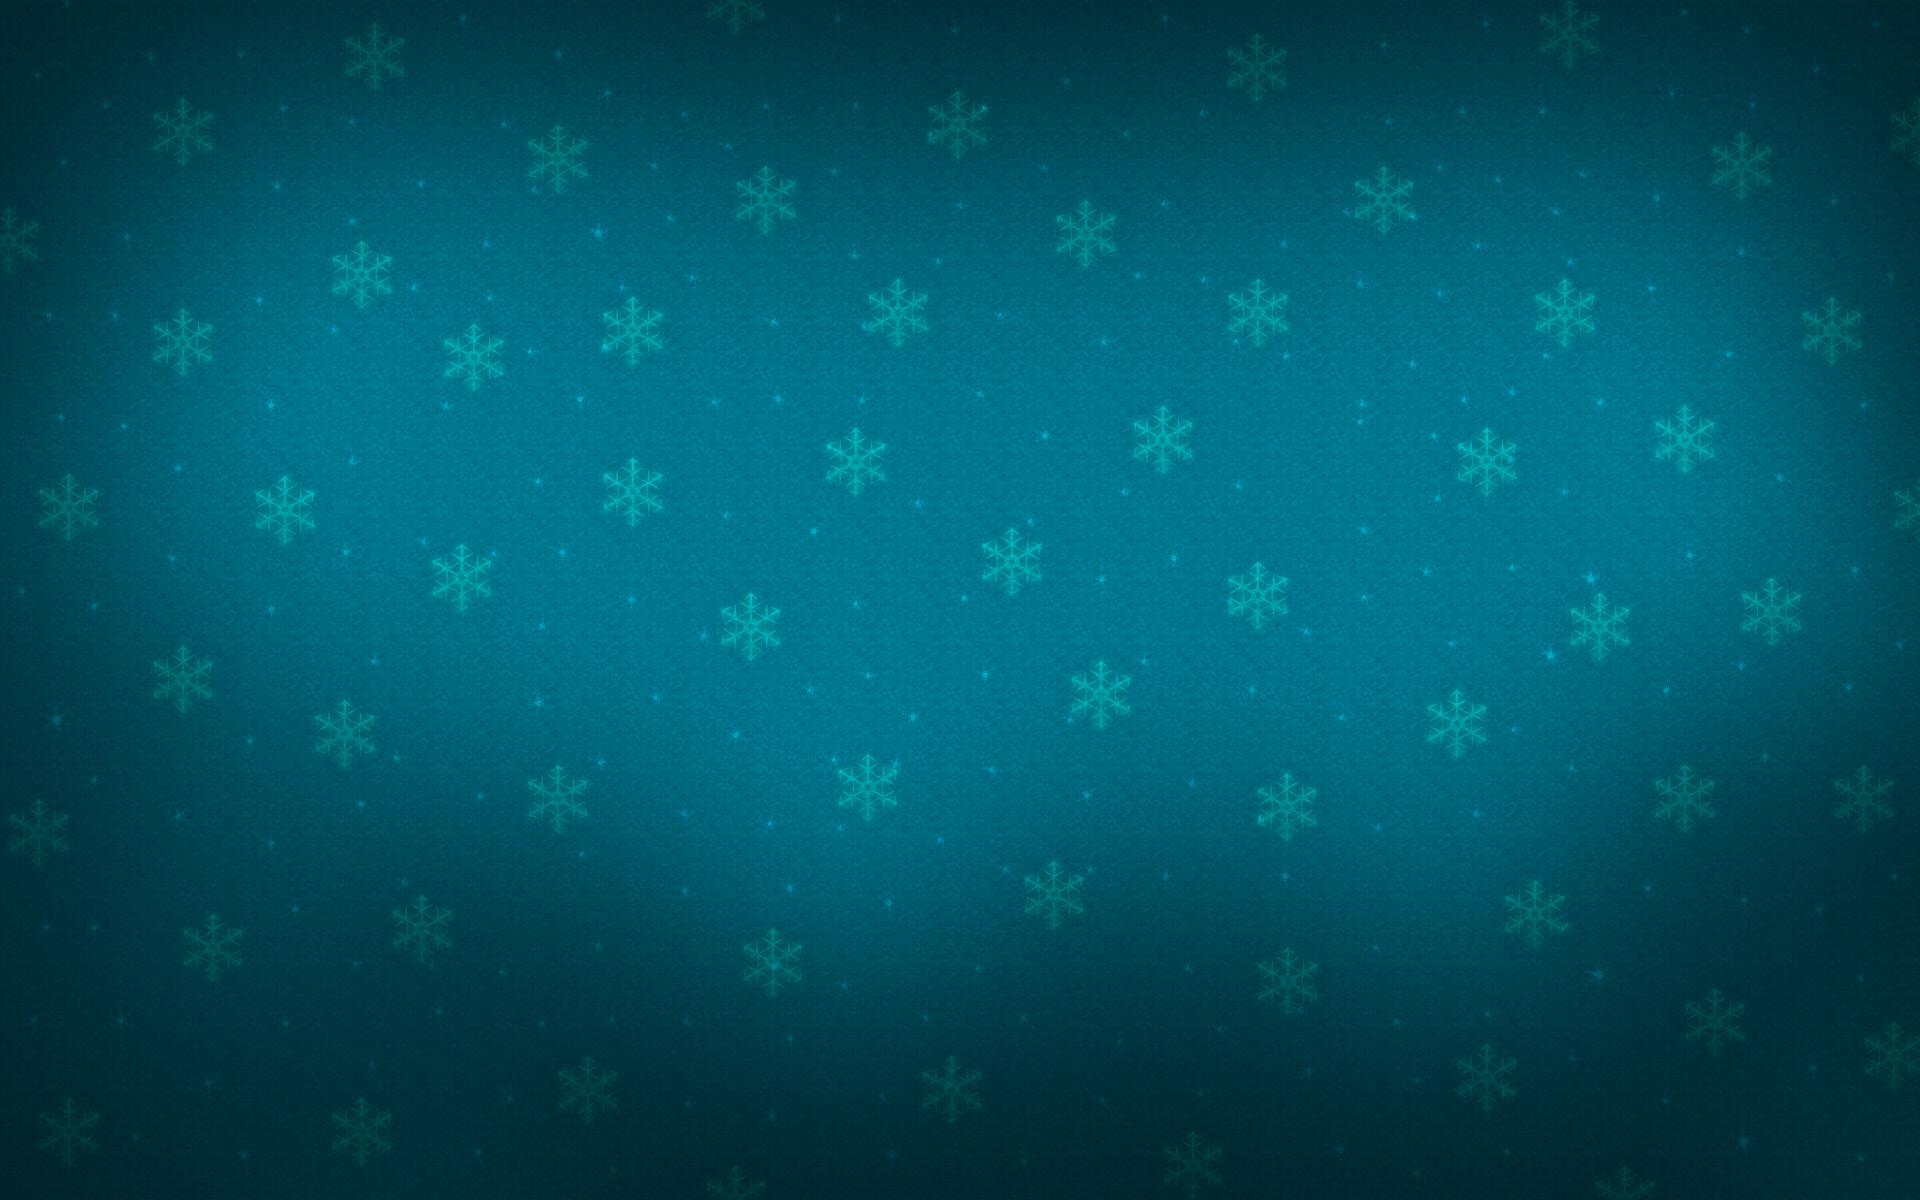 Dark Blue Christmas Background (24)